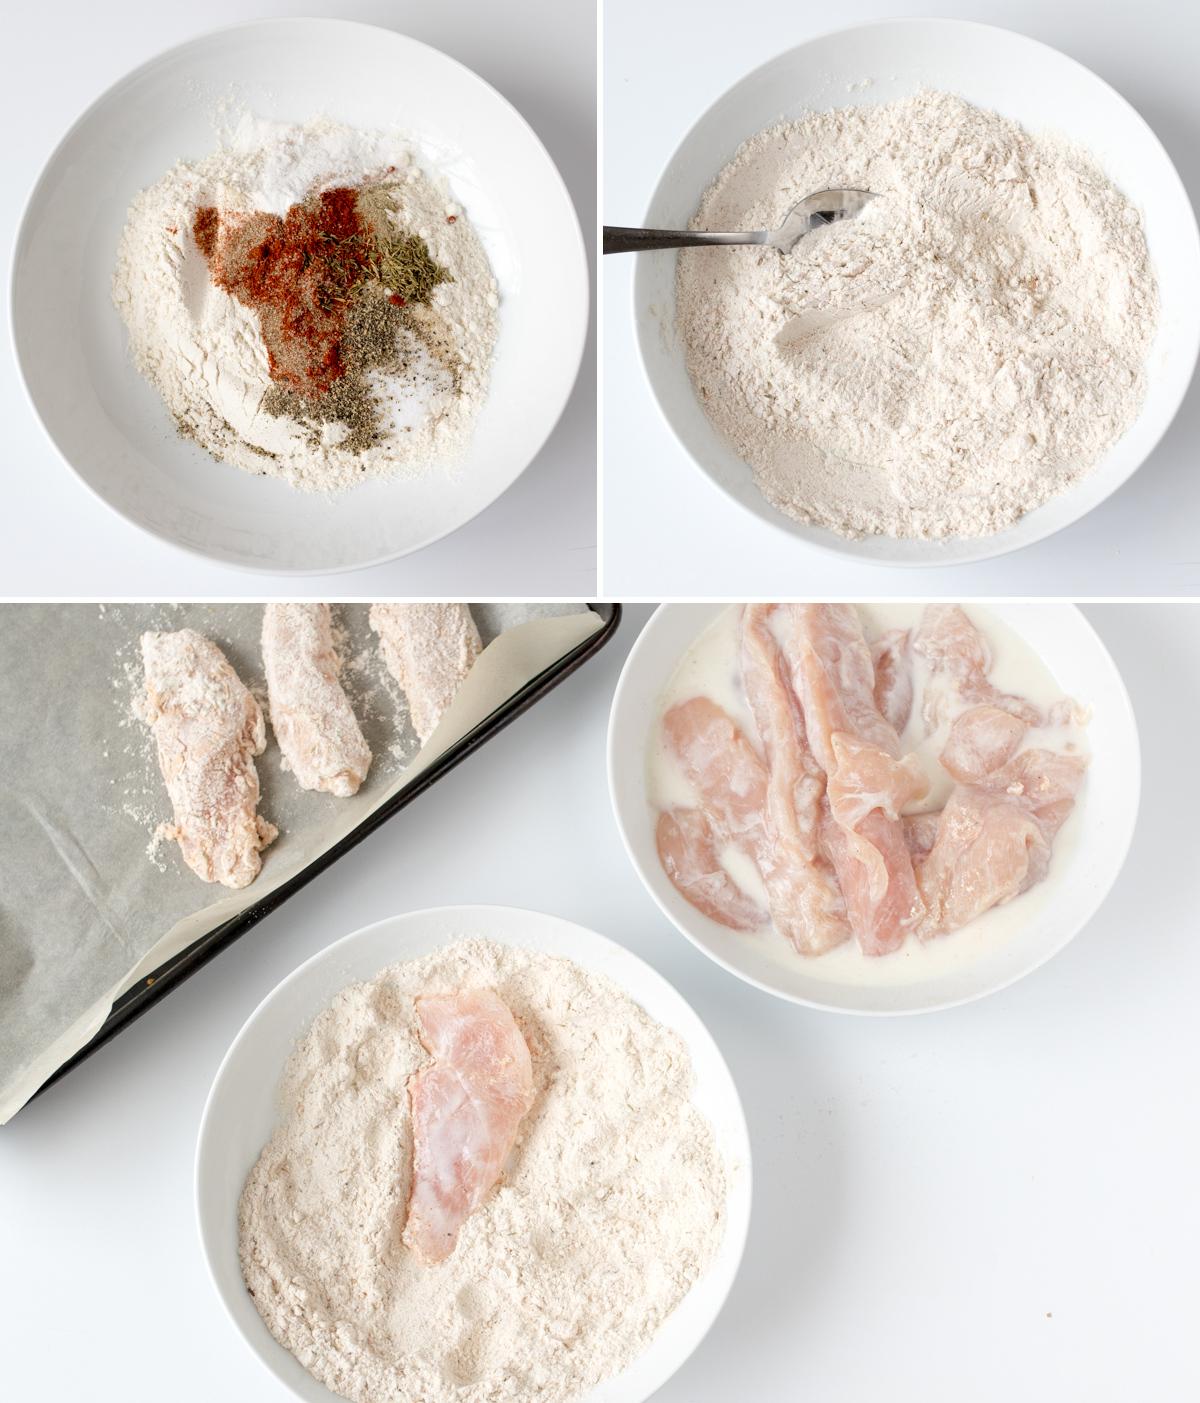 Buttermilk chicken tenders with honey mustard dip step 3 collage